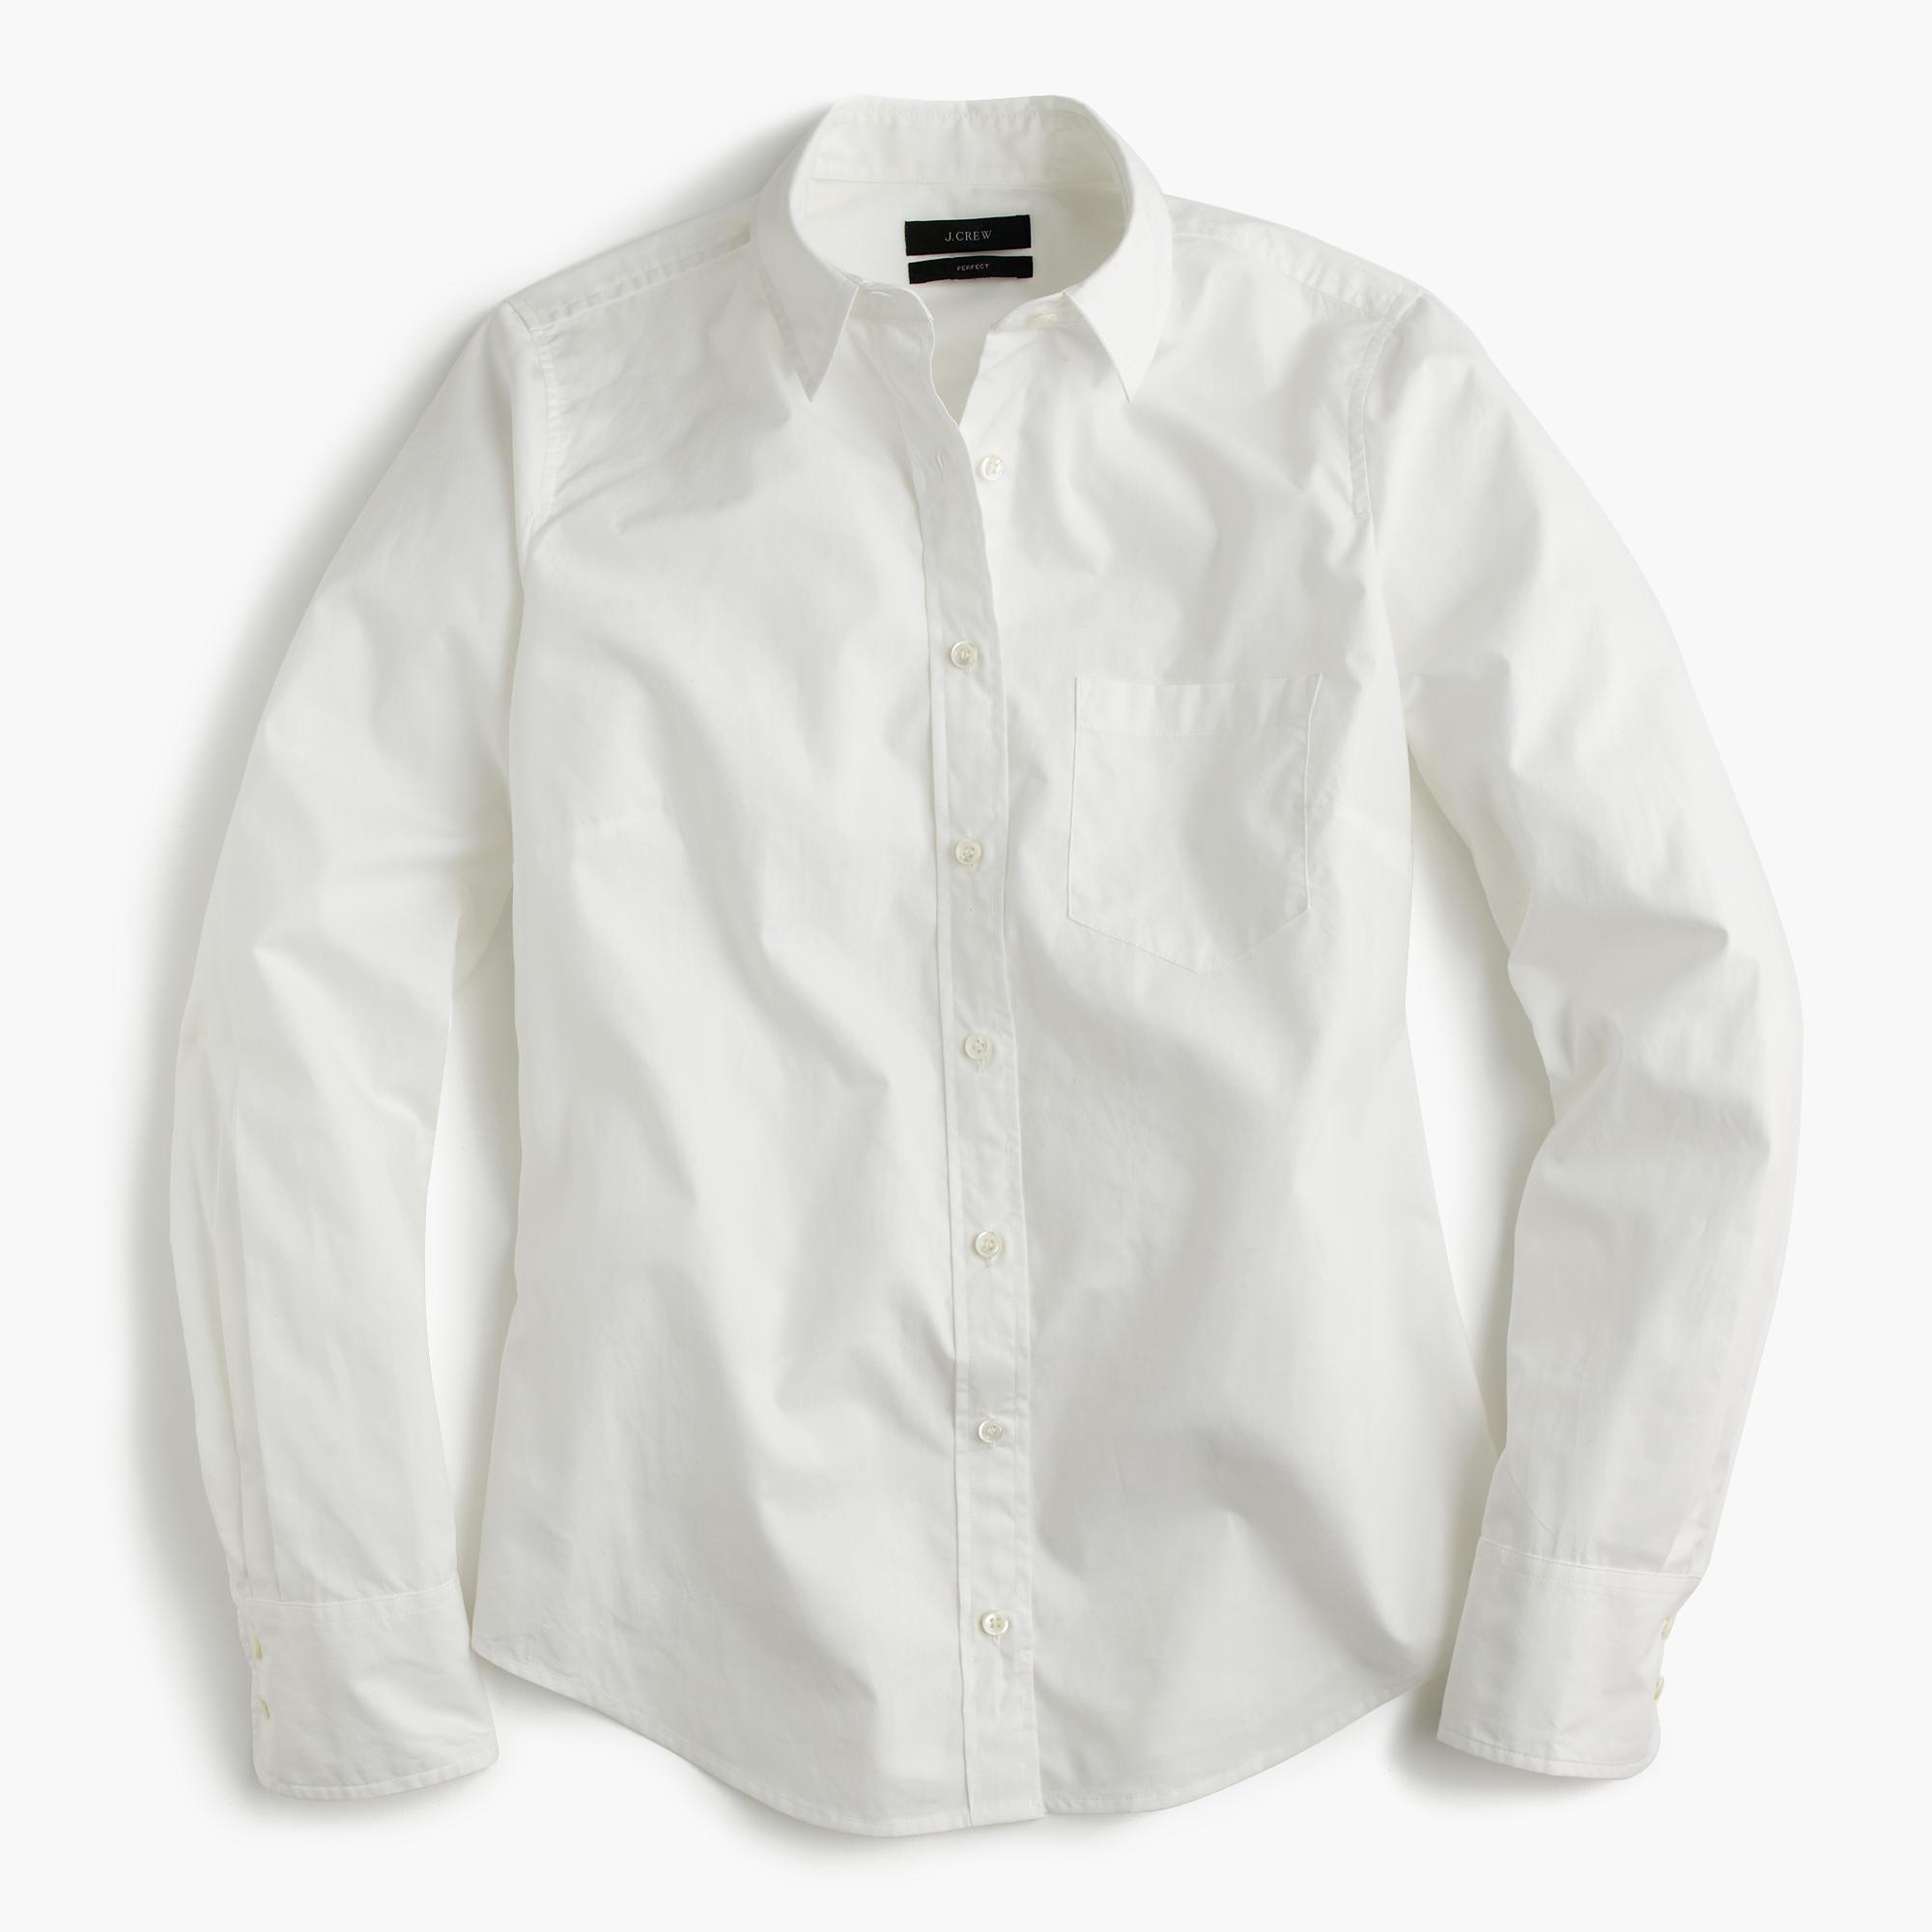 jcrew cotton poplin button down shirt.jpg